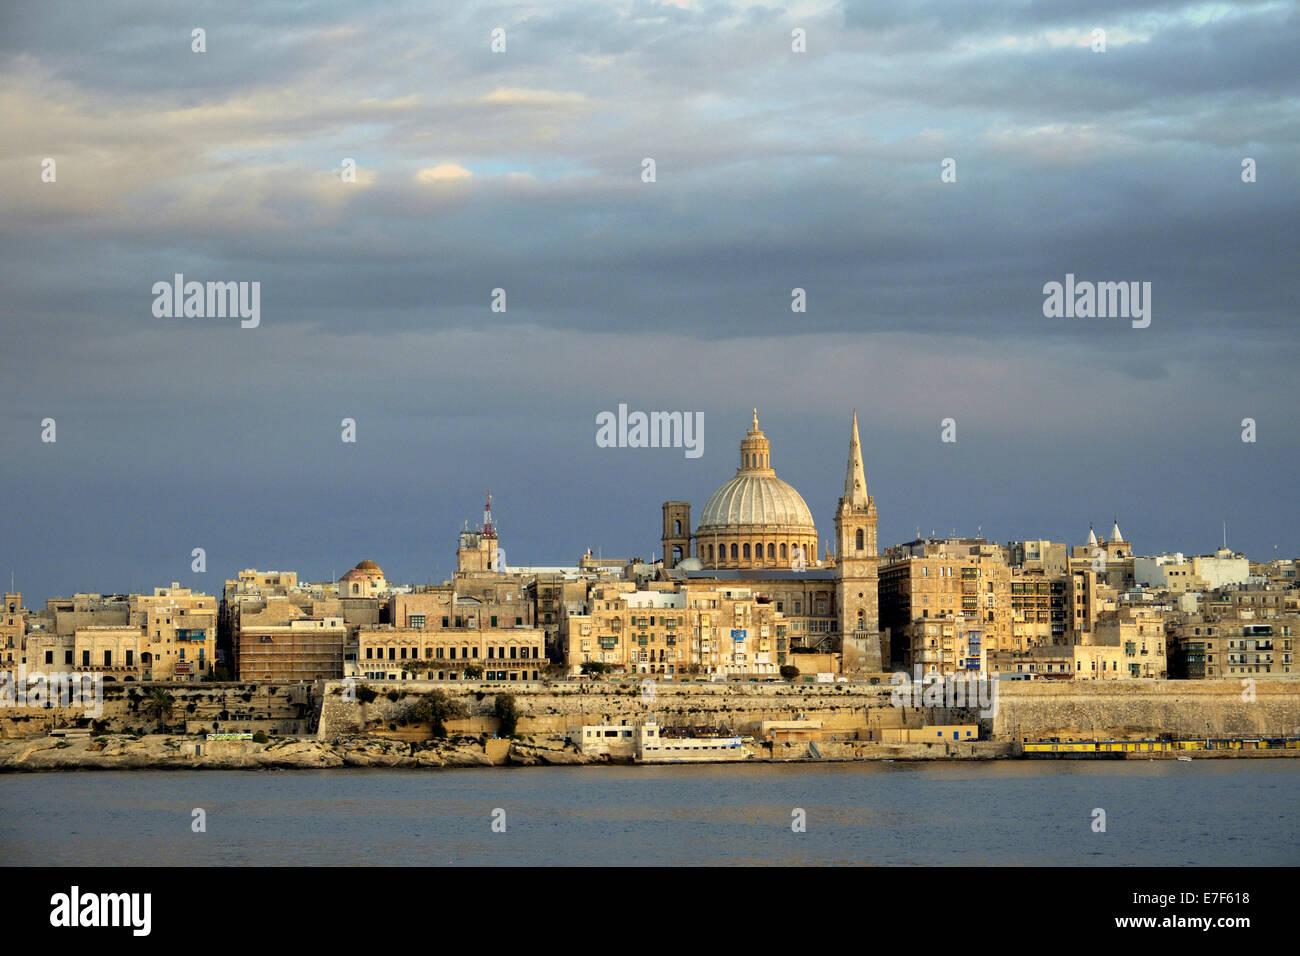 Valletta with the Carmelite Church, Valletta, Malta - Stock Image